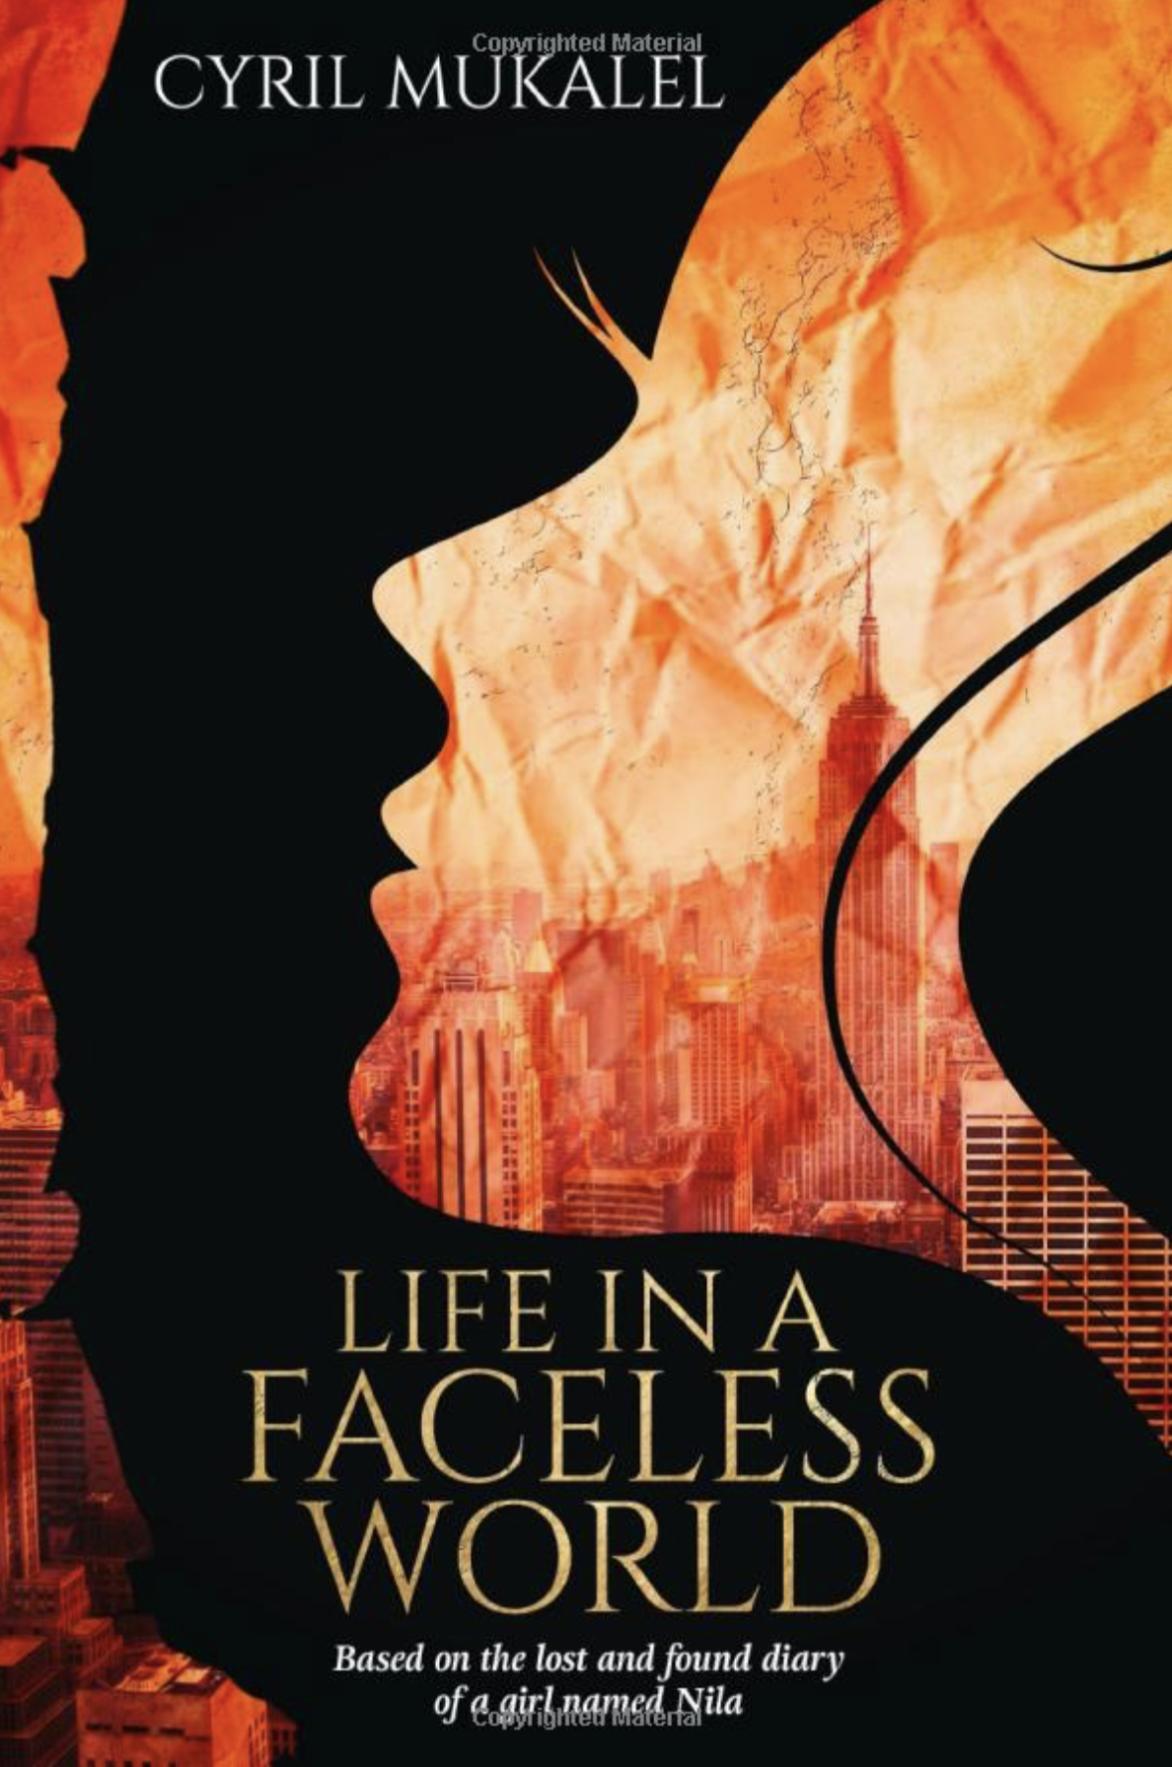 Life in a Faceless World novel